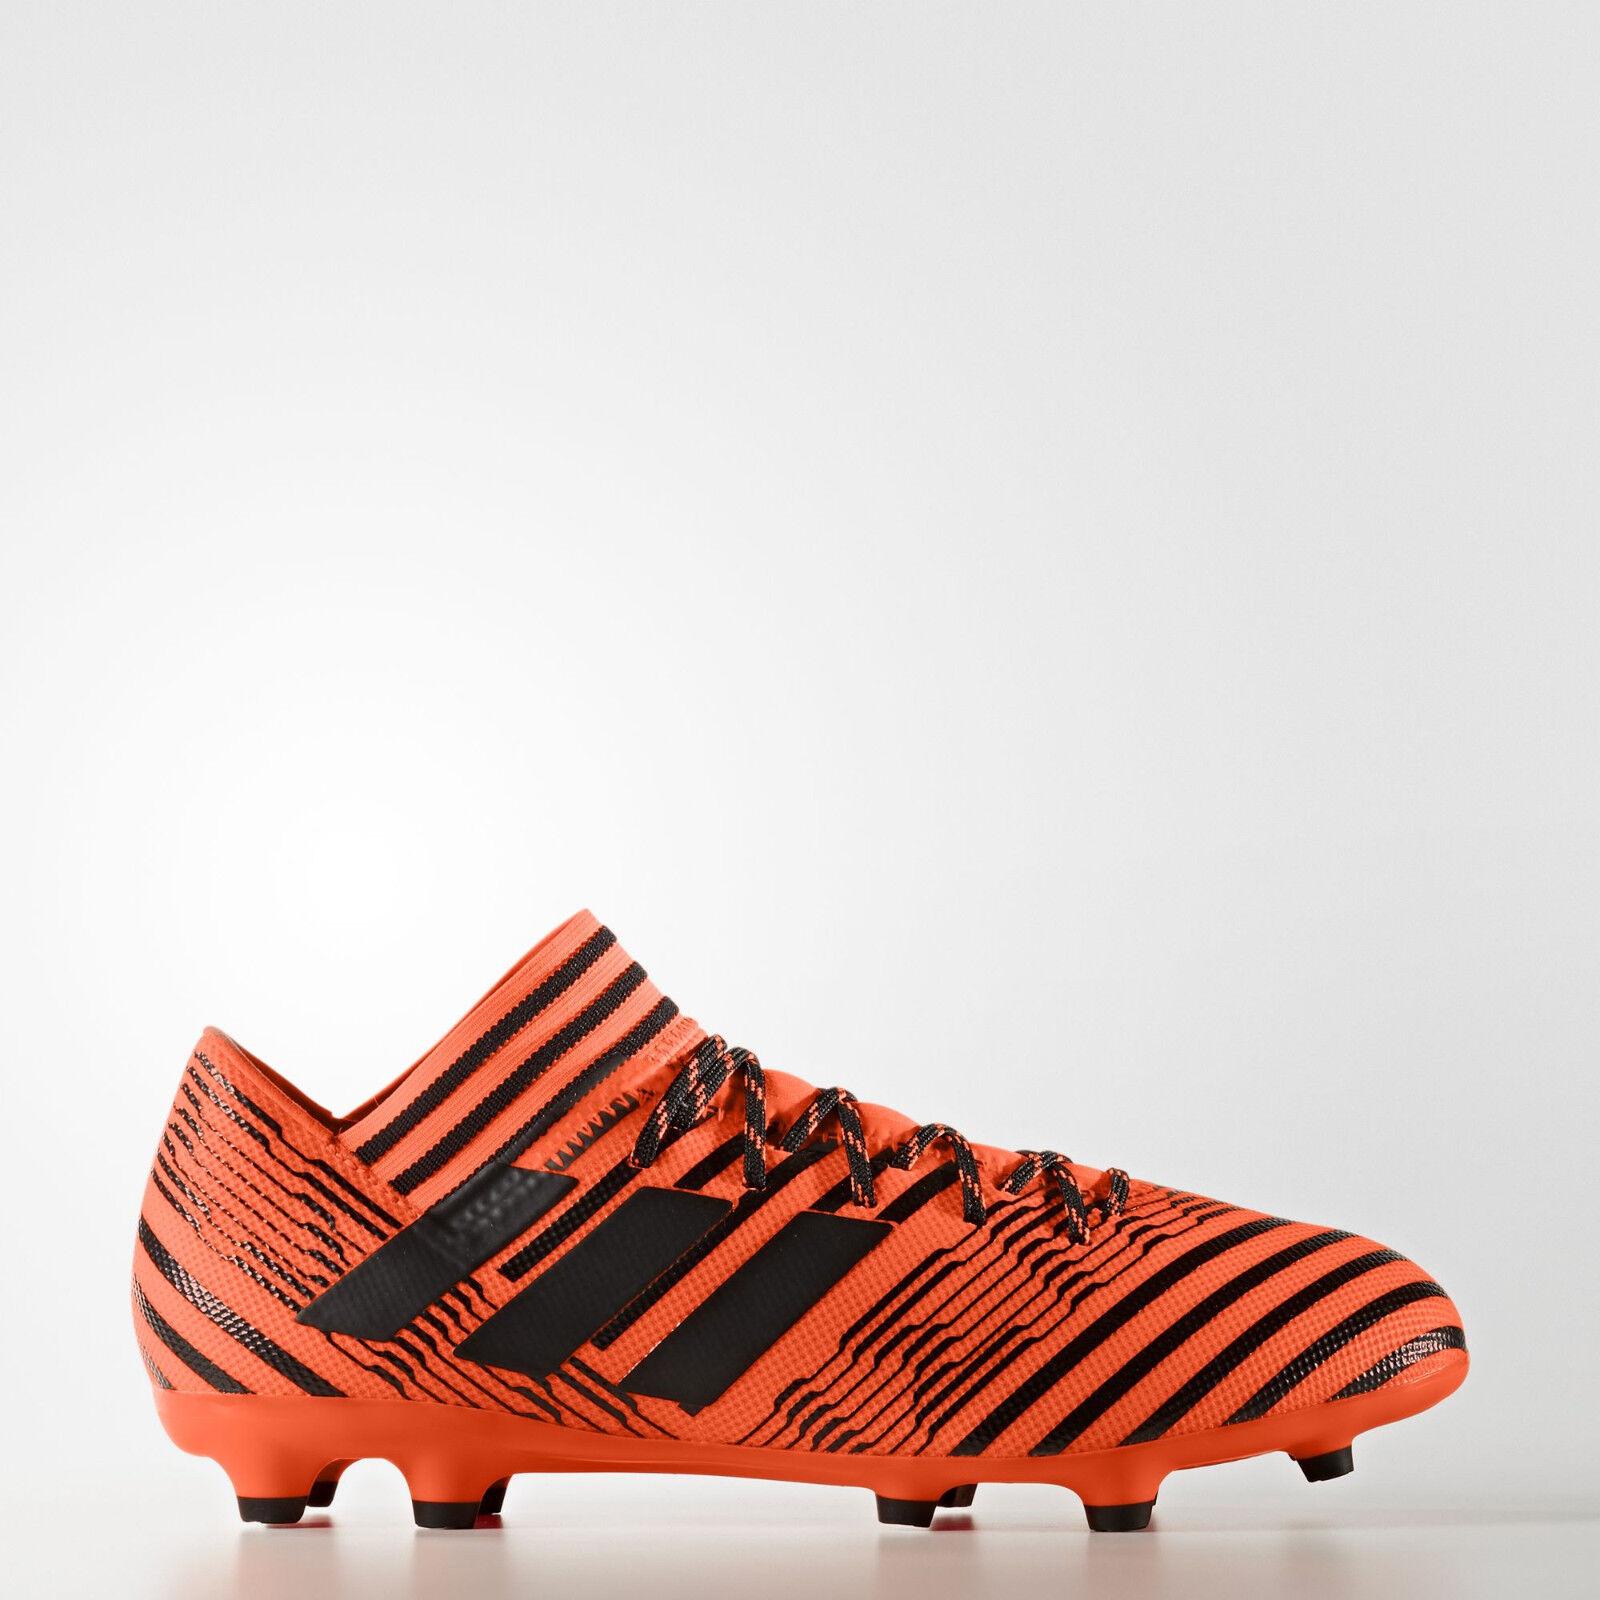 adidas Cleat Men's Nemeziz 17.3 FG Cleat adidas (Solar Orange/Black/Black) S80604* e7e894